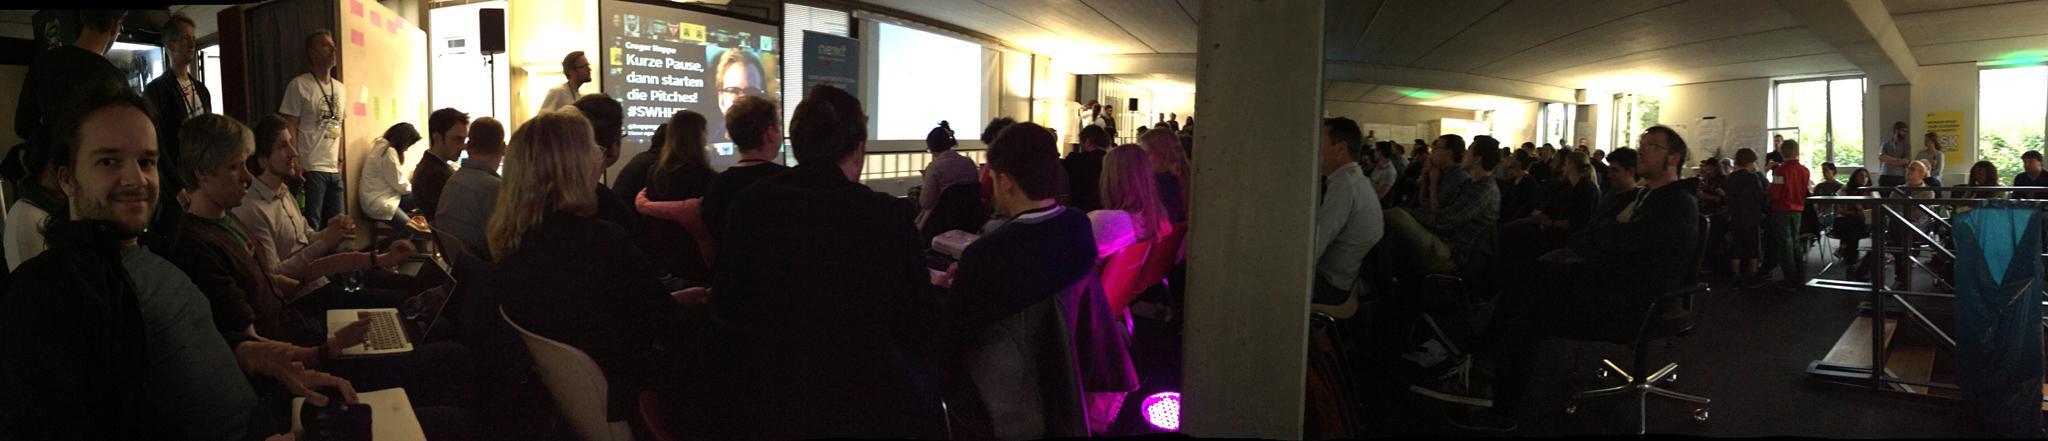 Startup Weekend Hamburg 2015 | noe.io